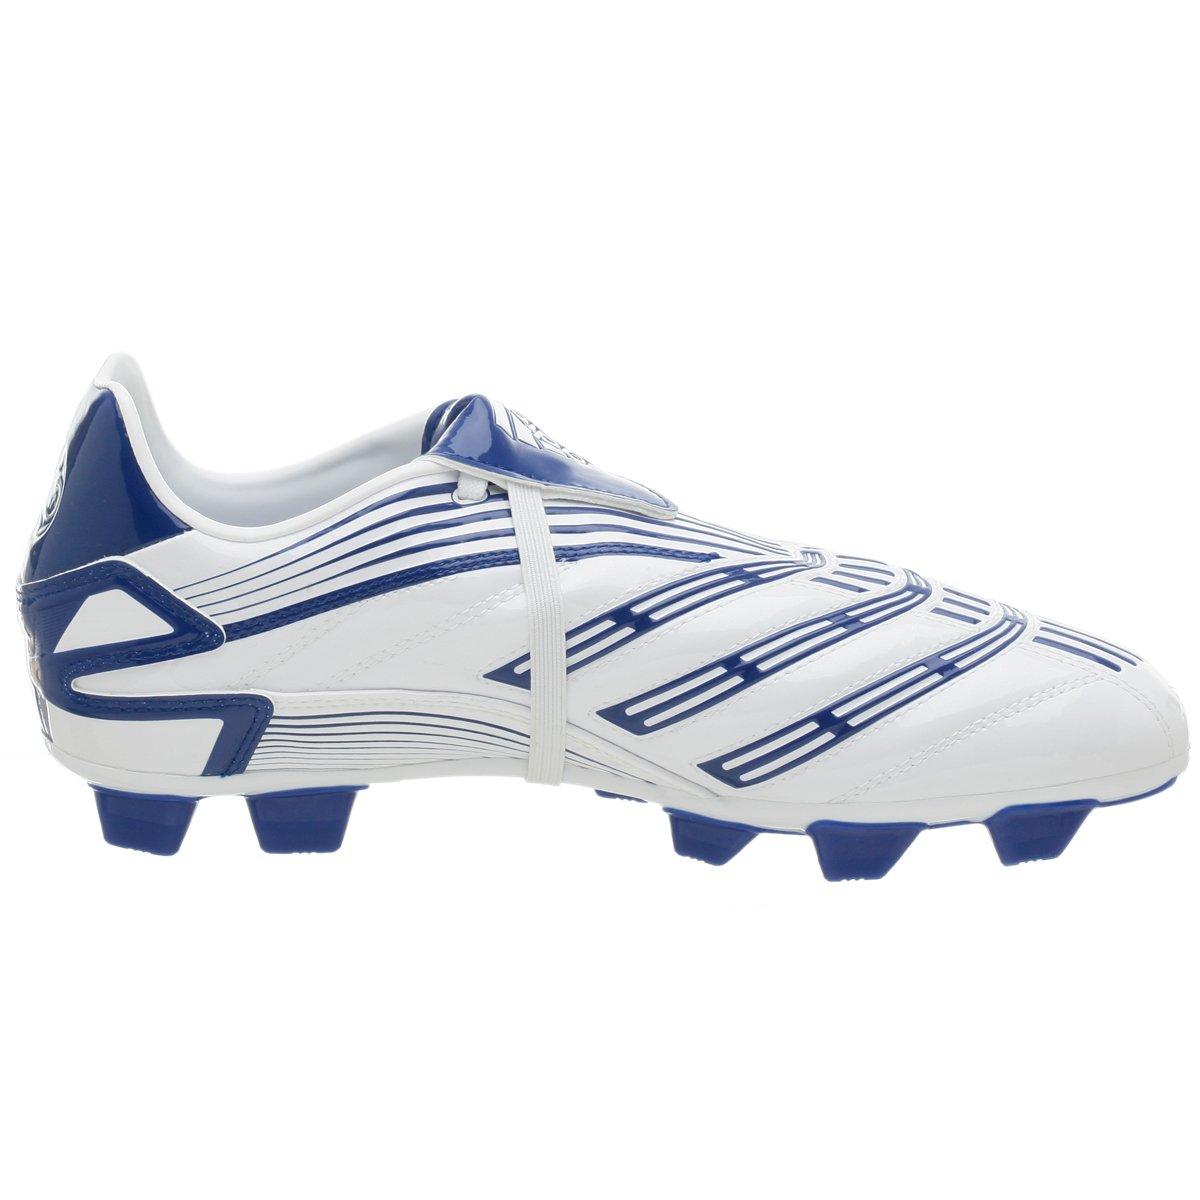 Best Price adidas Little KidBig Kid +Absolado TRXFG Soccer